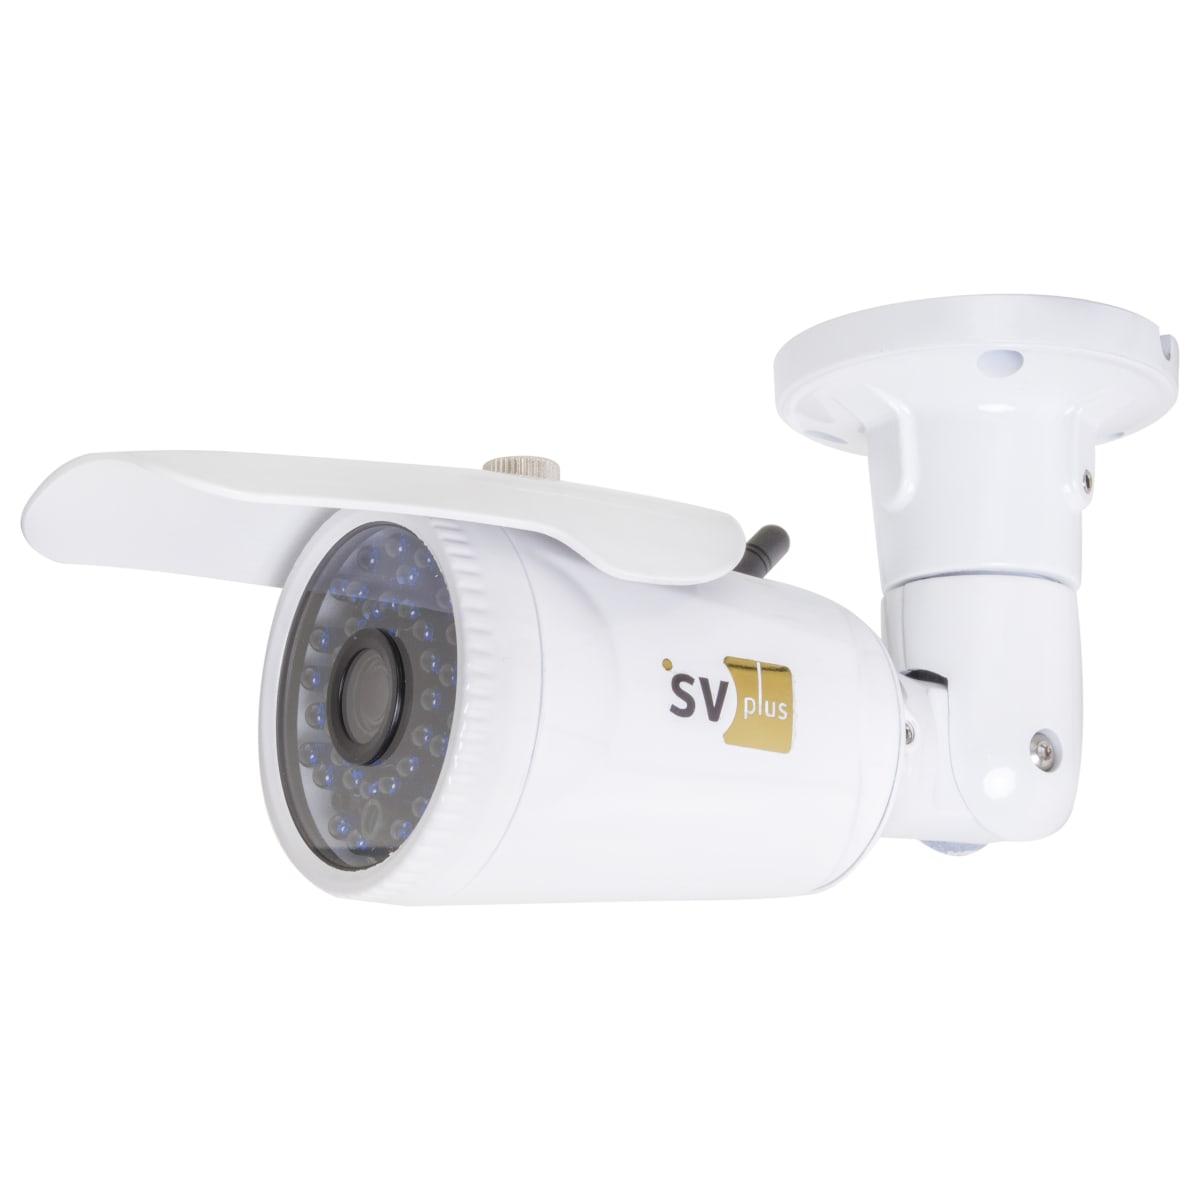 IP Камера уличная SVIP-430W с WiFi, HD